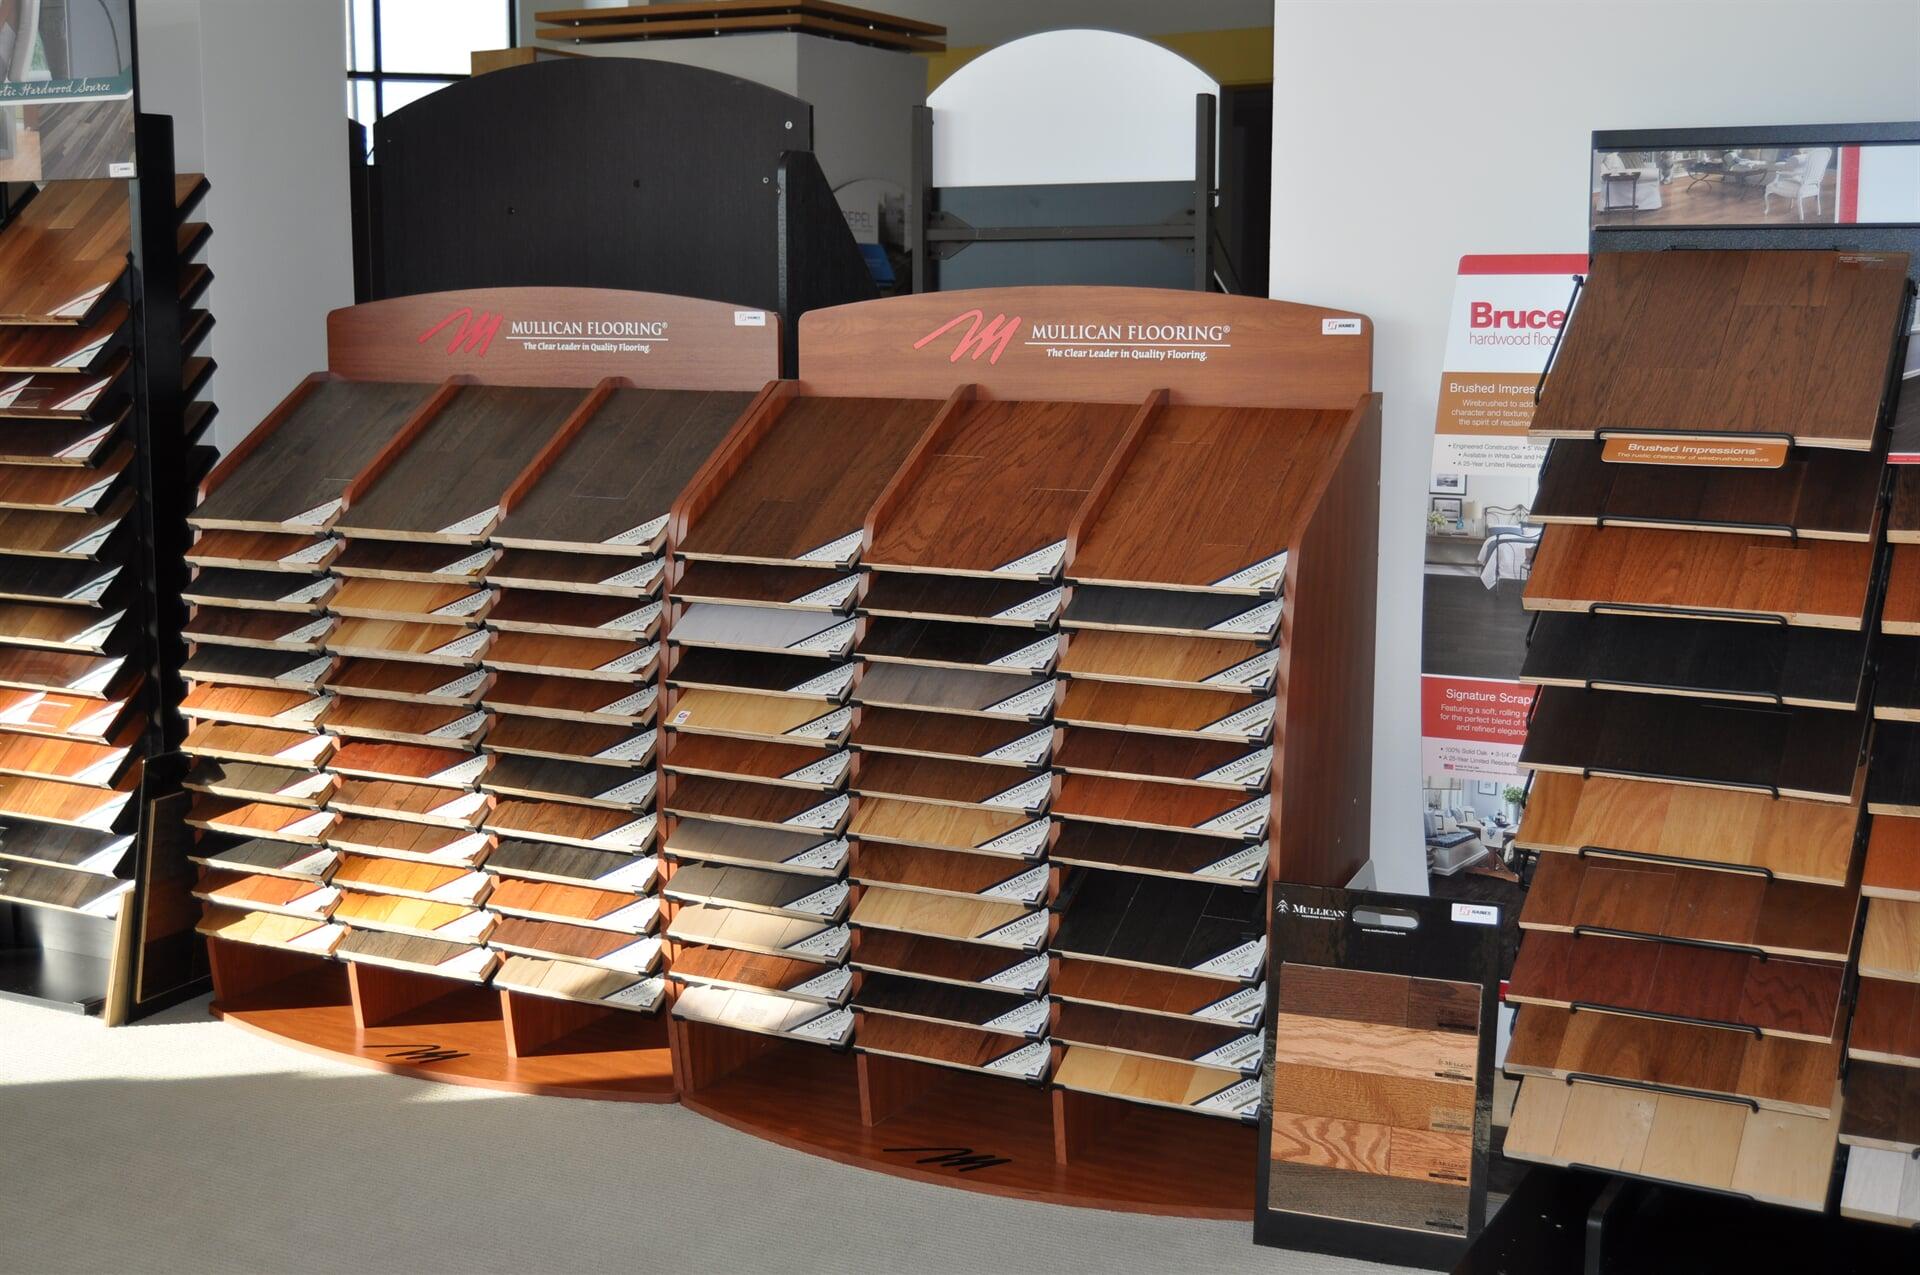 Mullican Flooring for your Rome, GA home from Beckler's Flooring Center